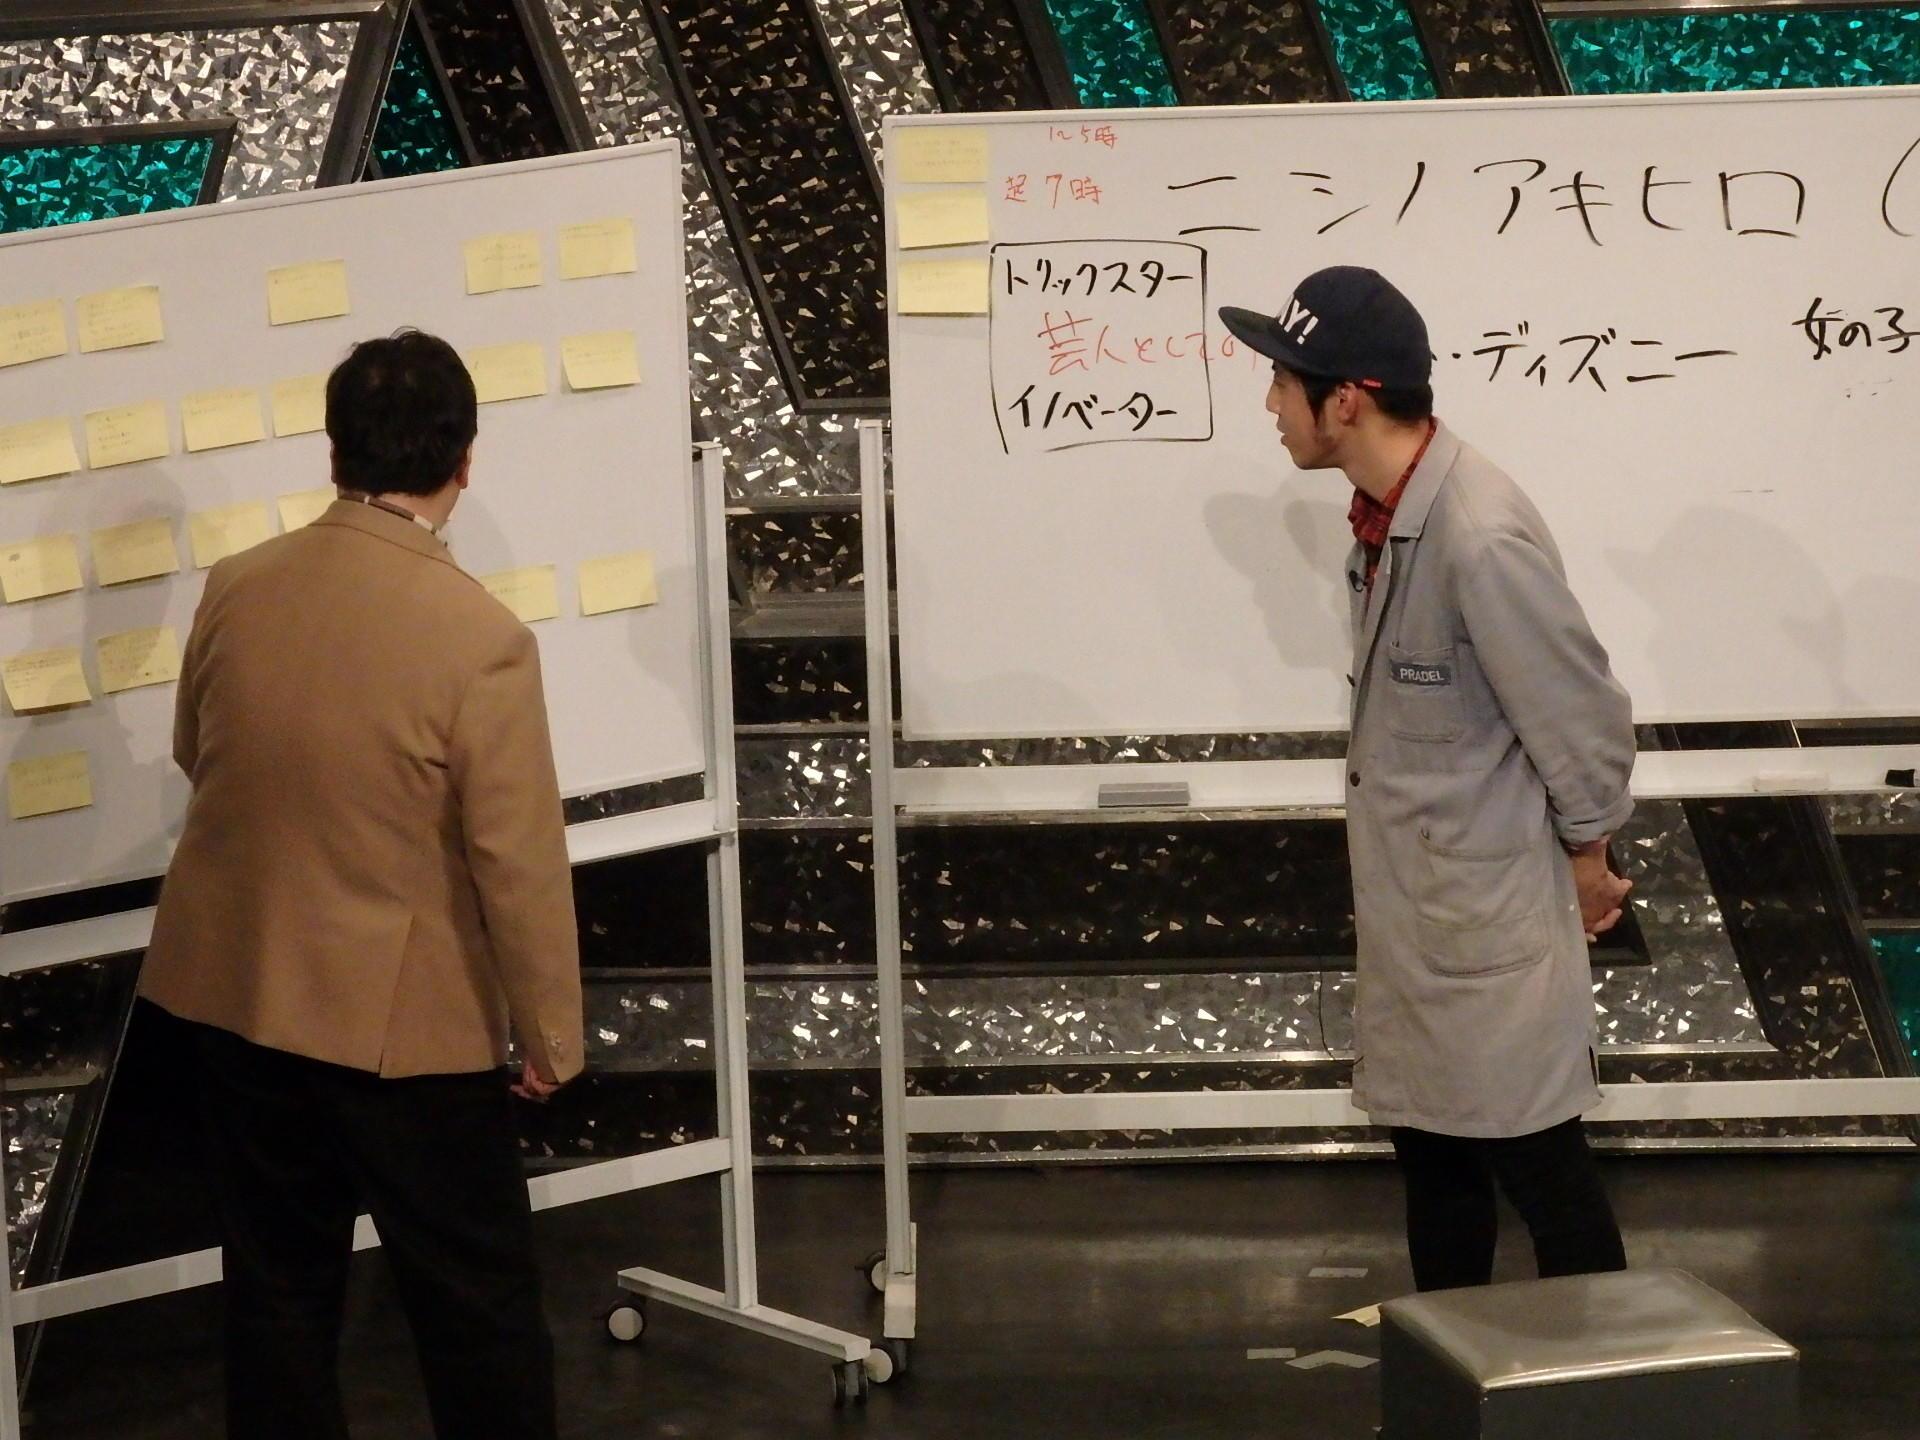 http://news.yoshimoto.co.jp/20160116182249-2b9cab25b506b8319c25f45e190132a874983d64.jpg